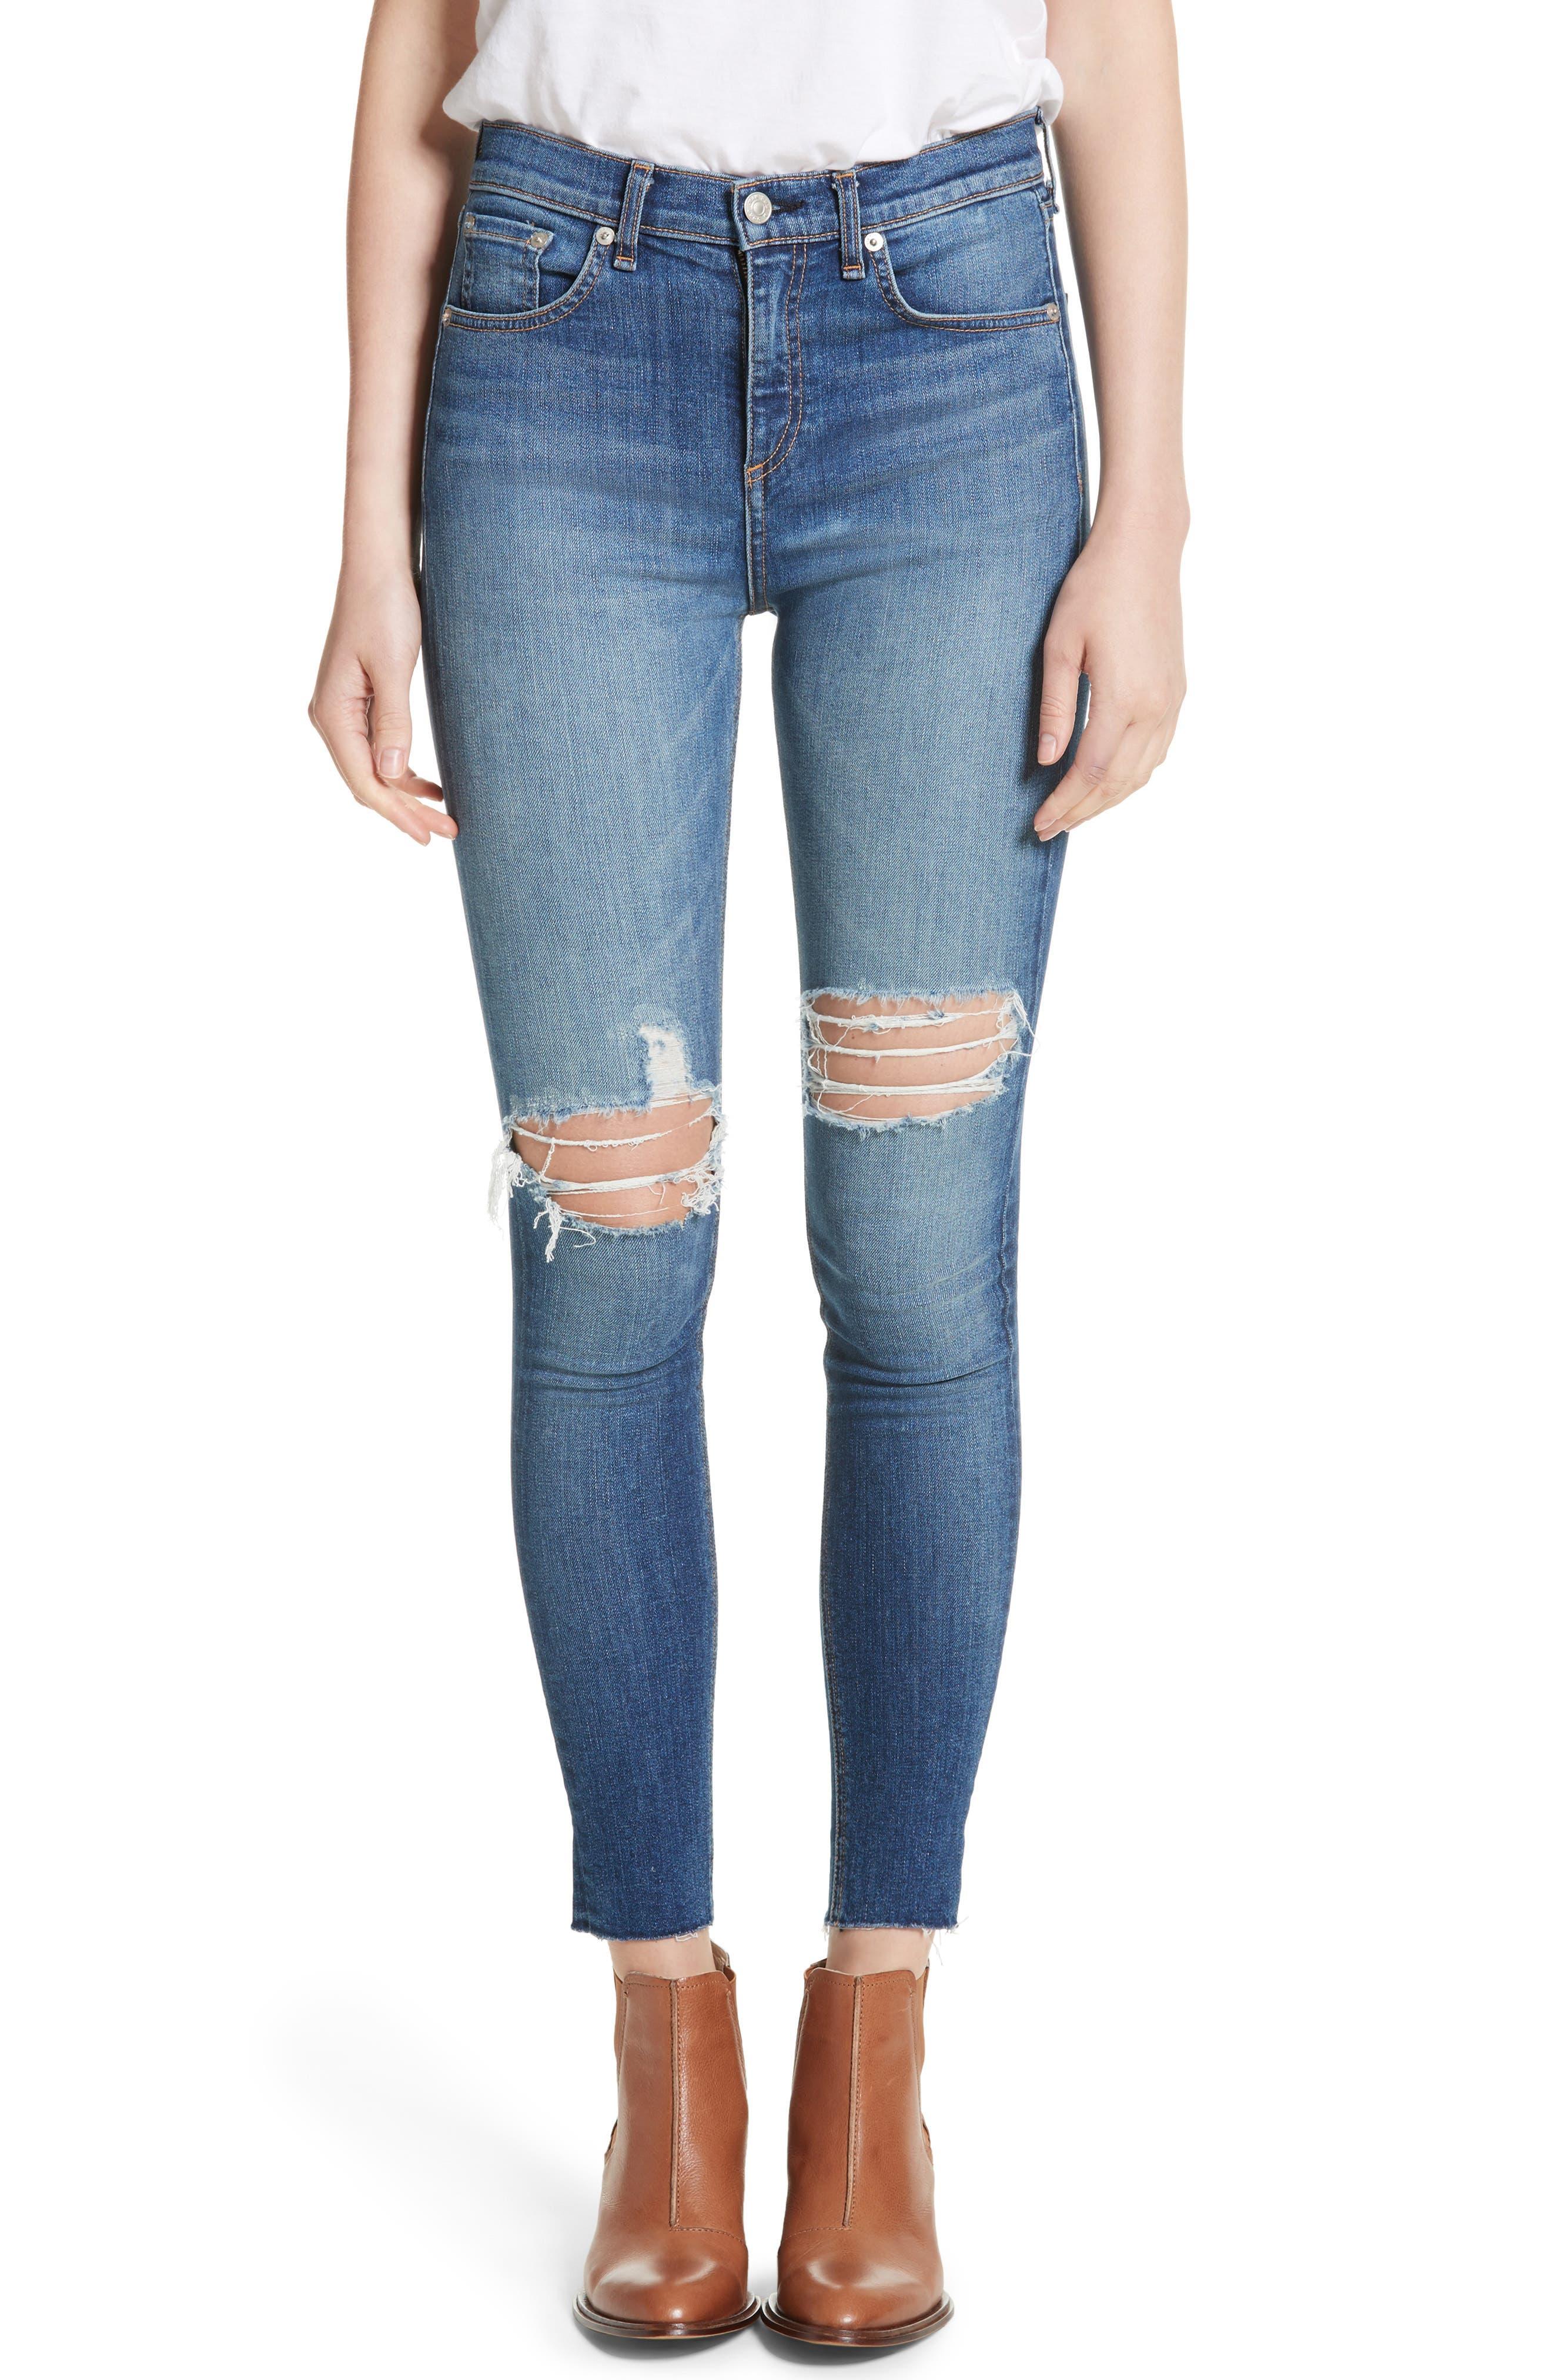 Alternate Image 1 Selected - rag & bone/JEAN Ripped High Waist Skinny Jeans (Bonnie)